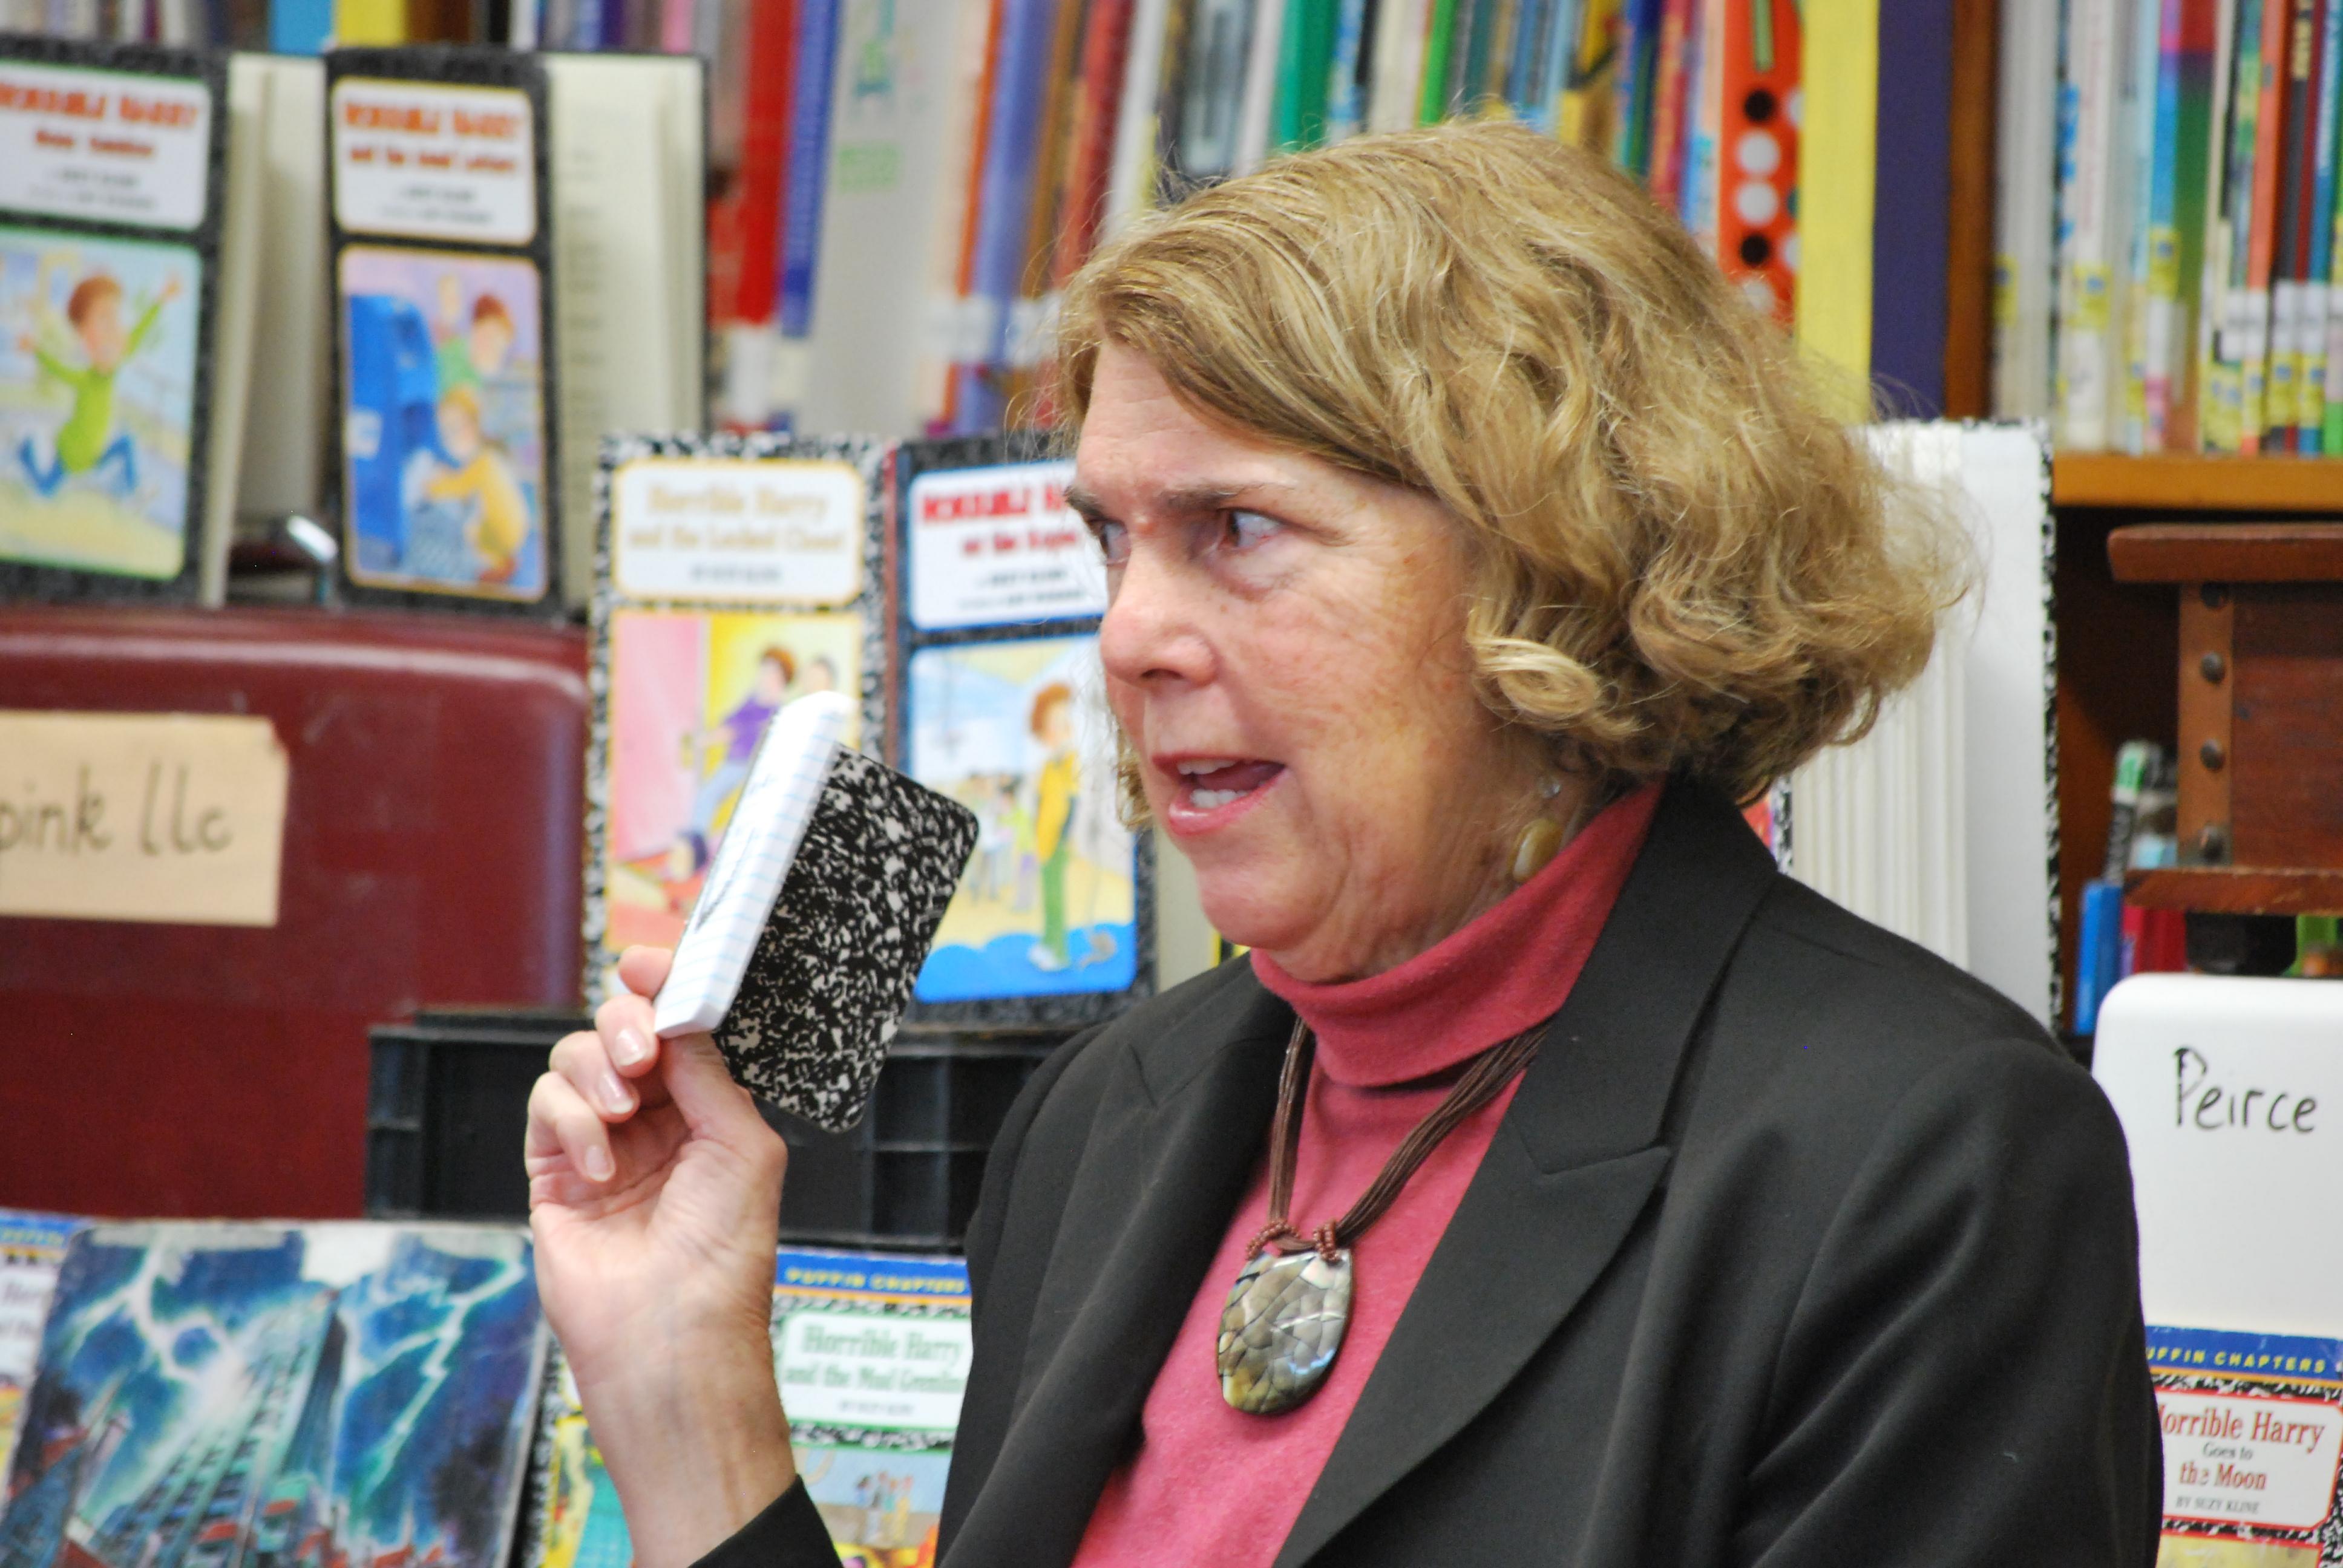 Suzy Kline author visit, notebook, seeds of book ideas